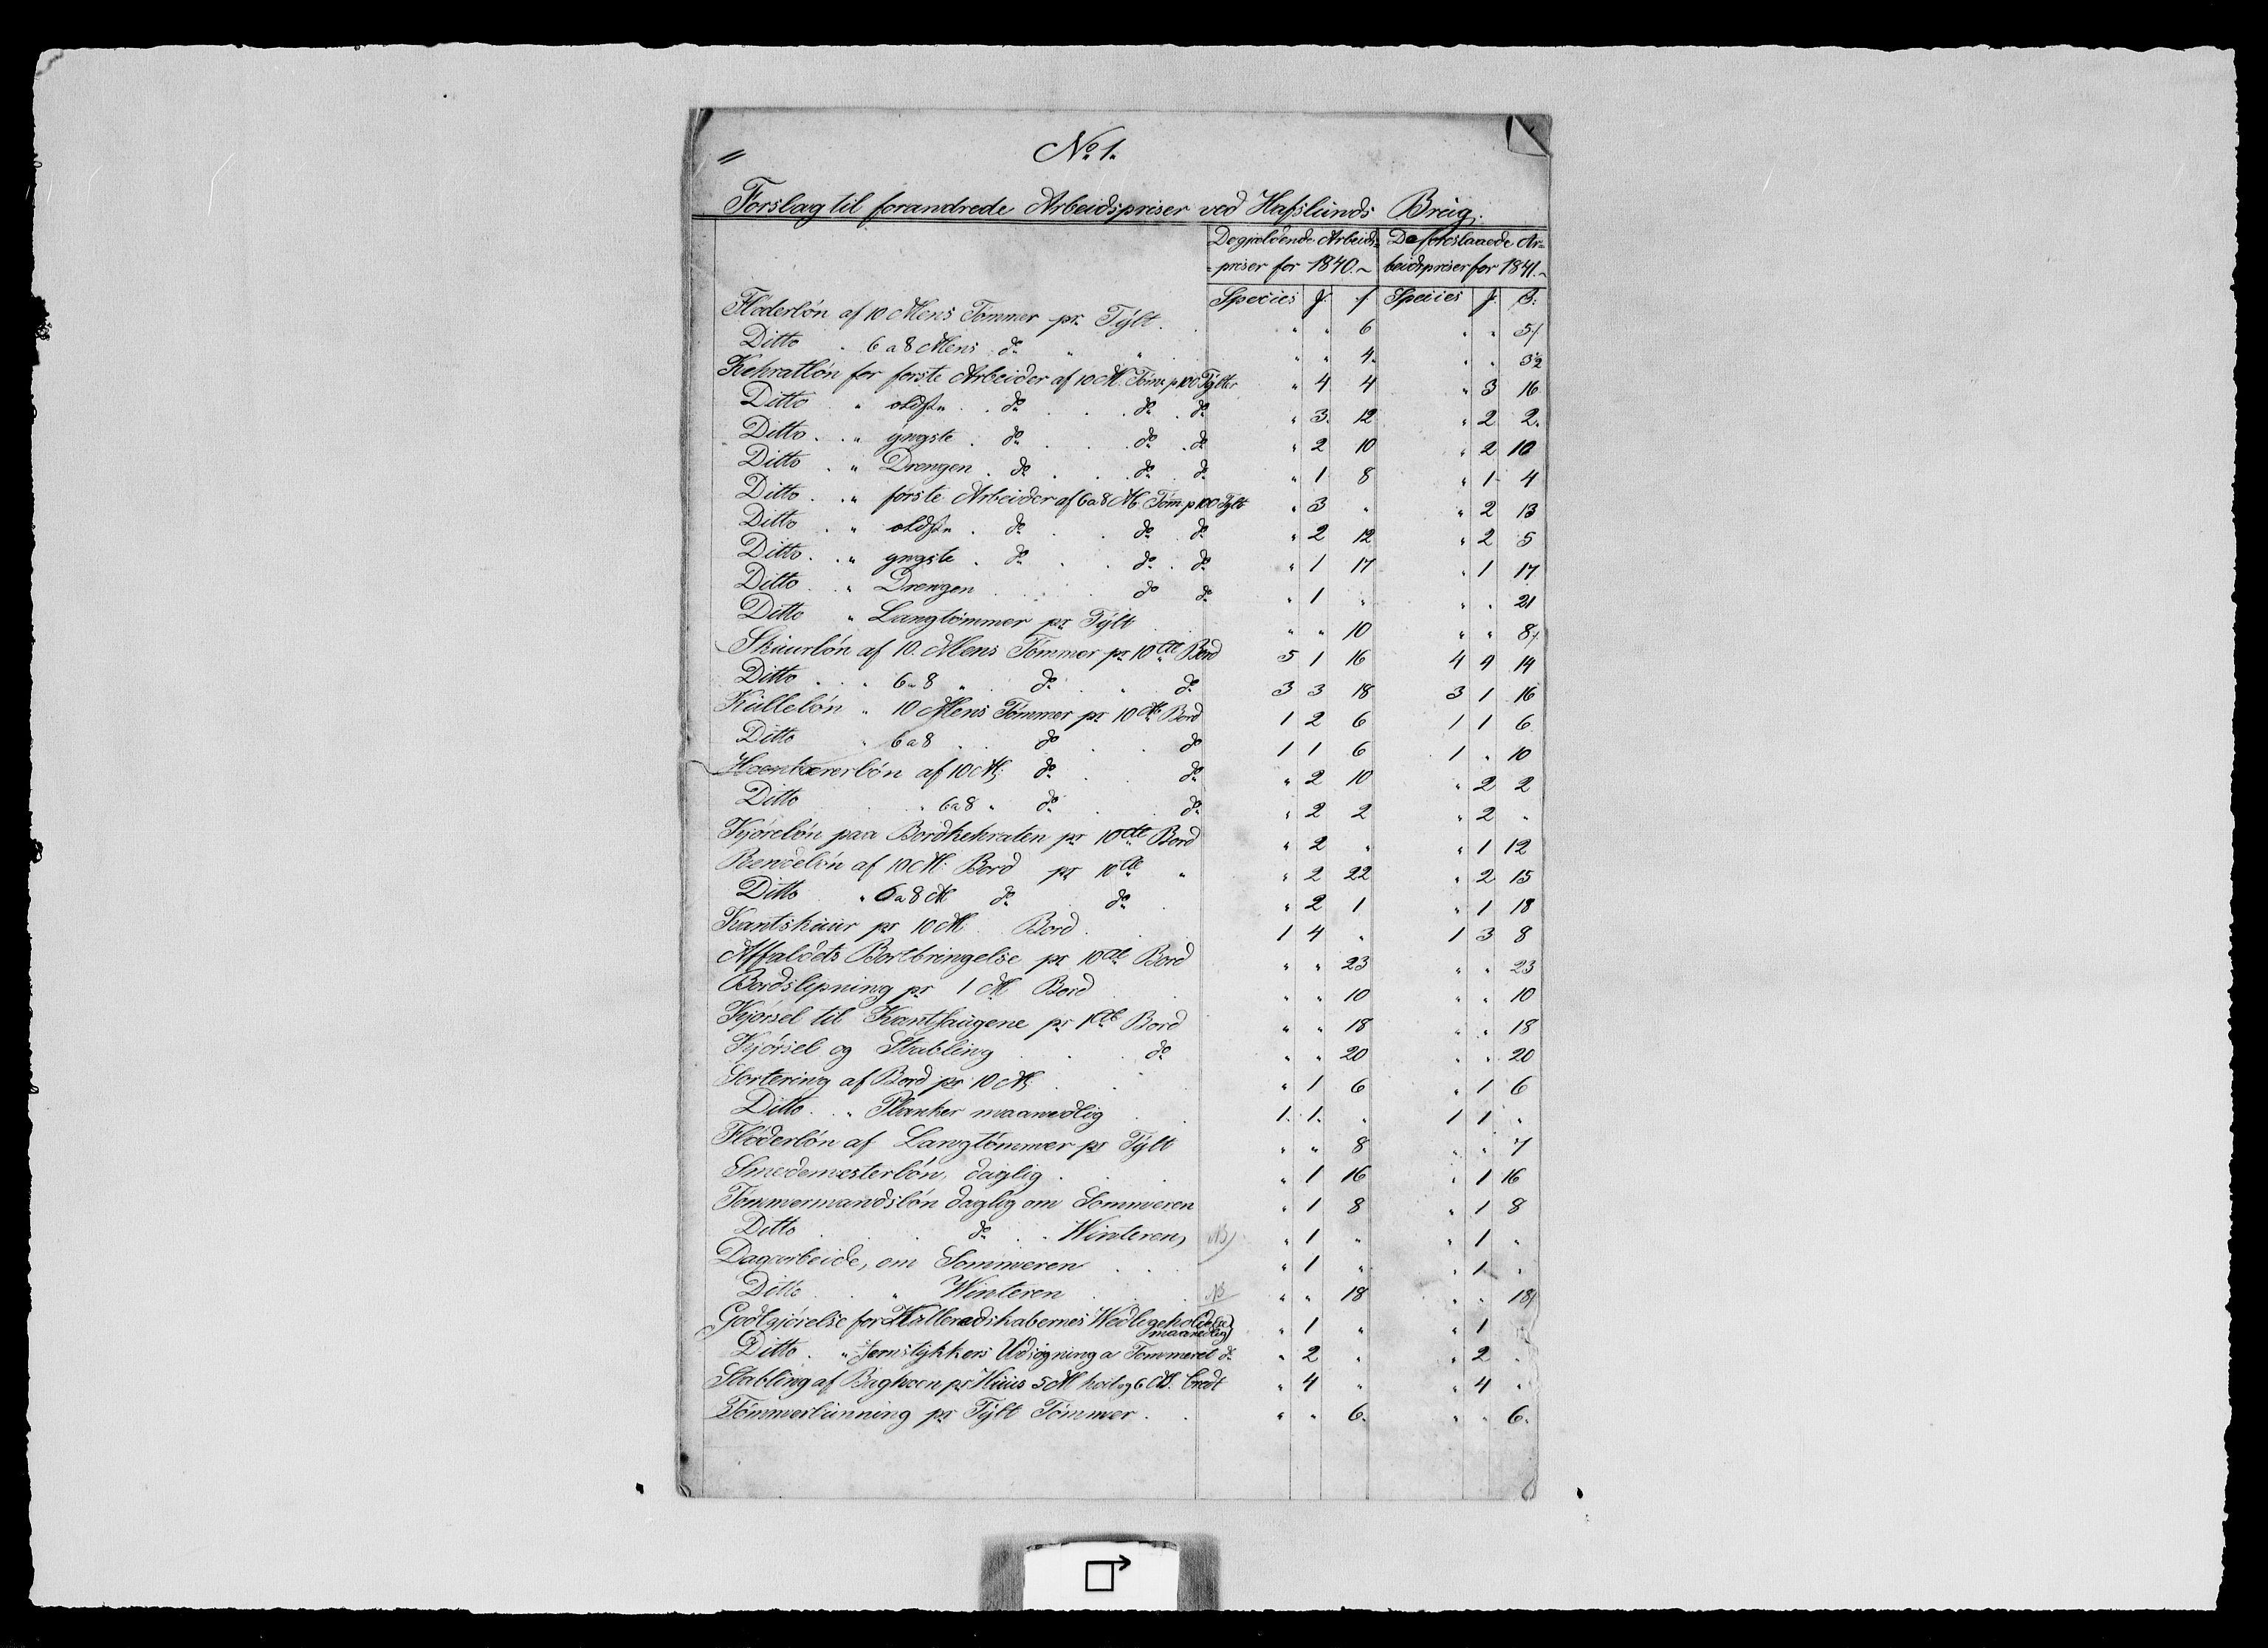 RA, Modums Blaafarveværk, G/Gk/L0385, 1825-1845, s. 2